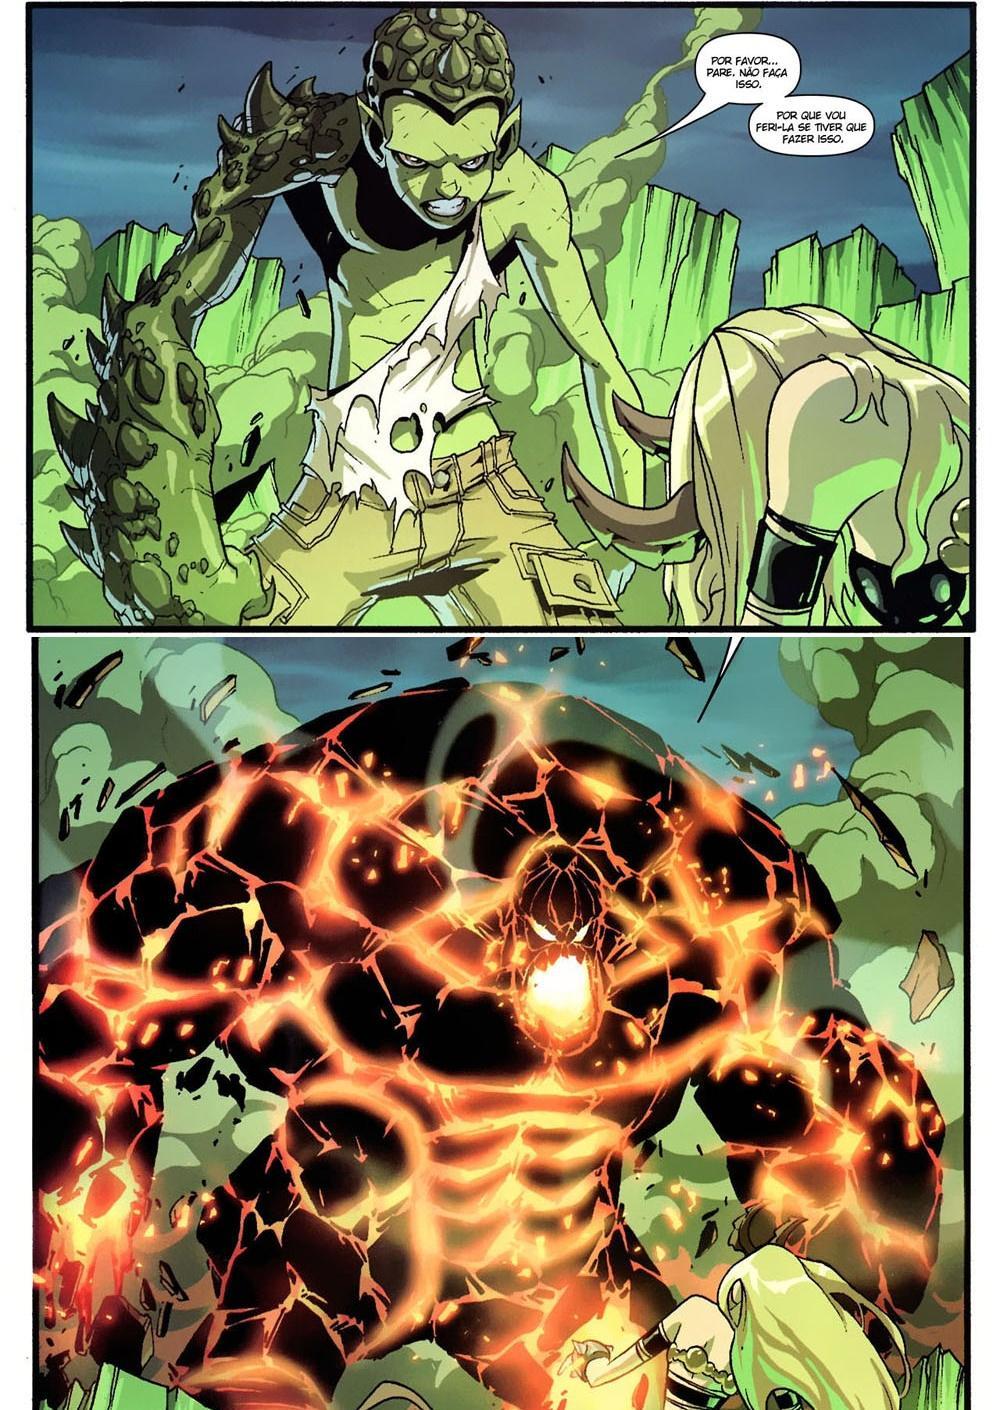 Novos X-Men - Academia X Em Busca de Magia 4